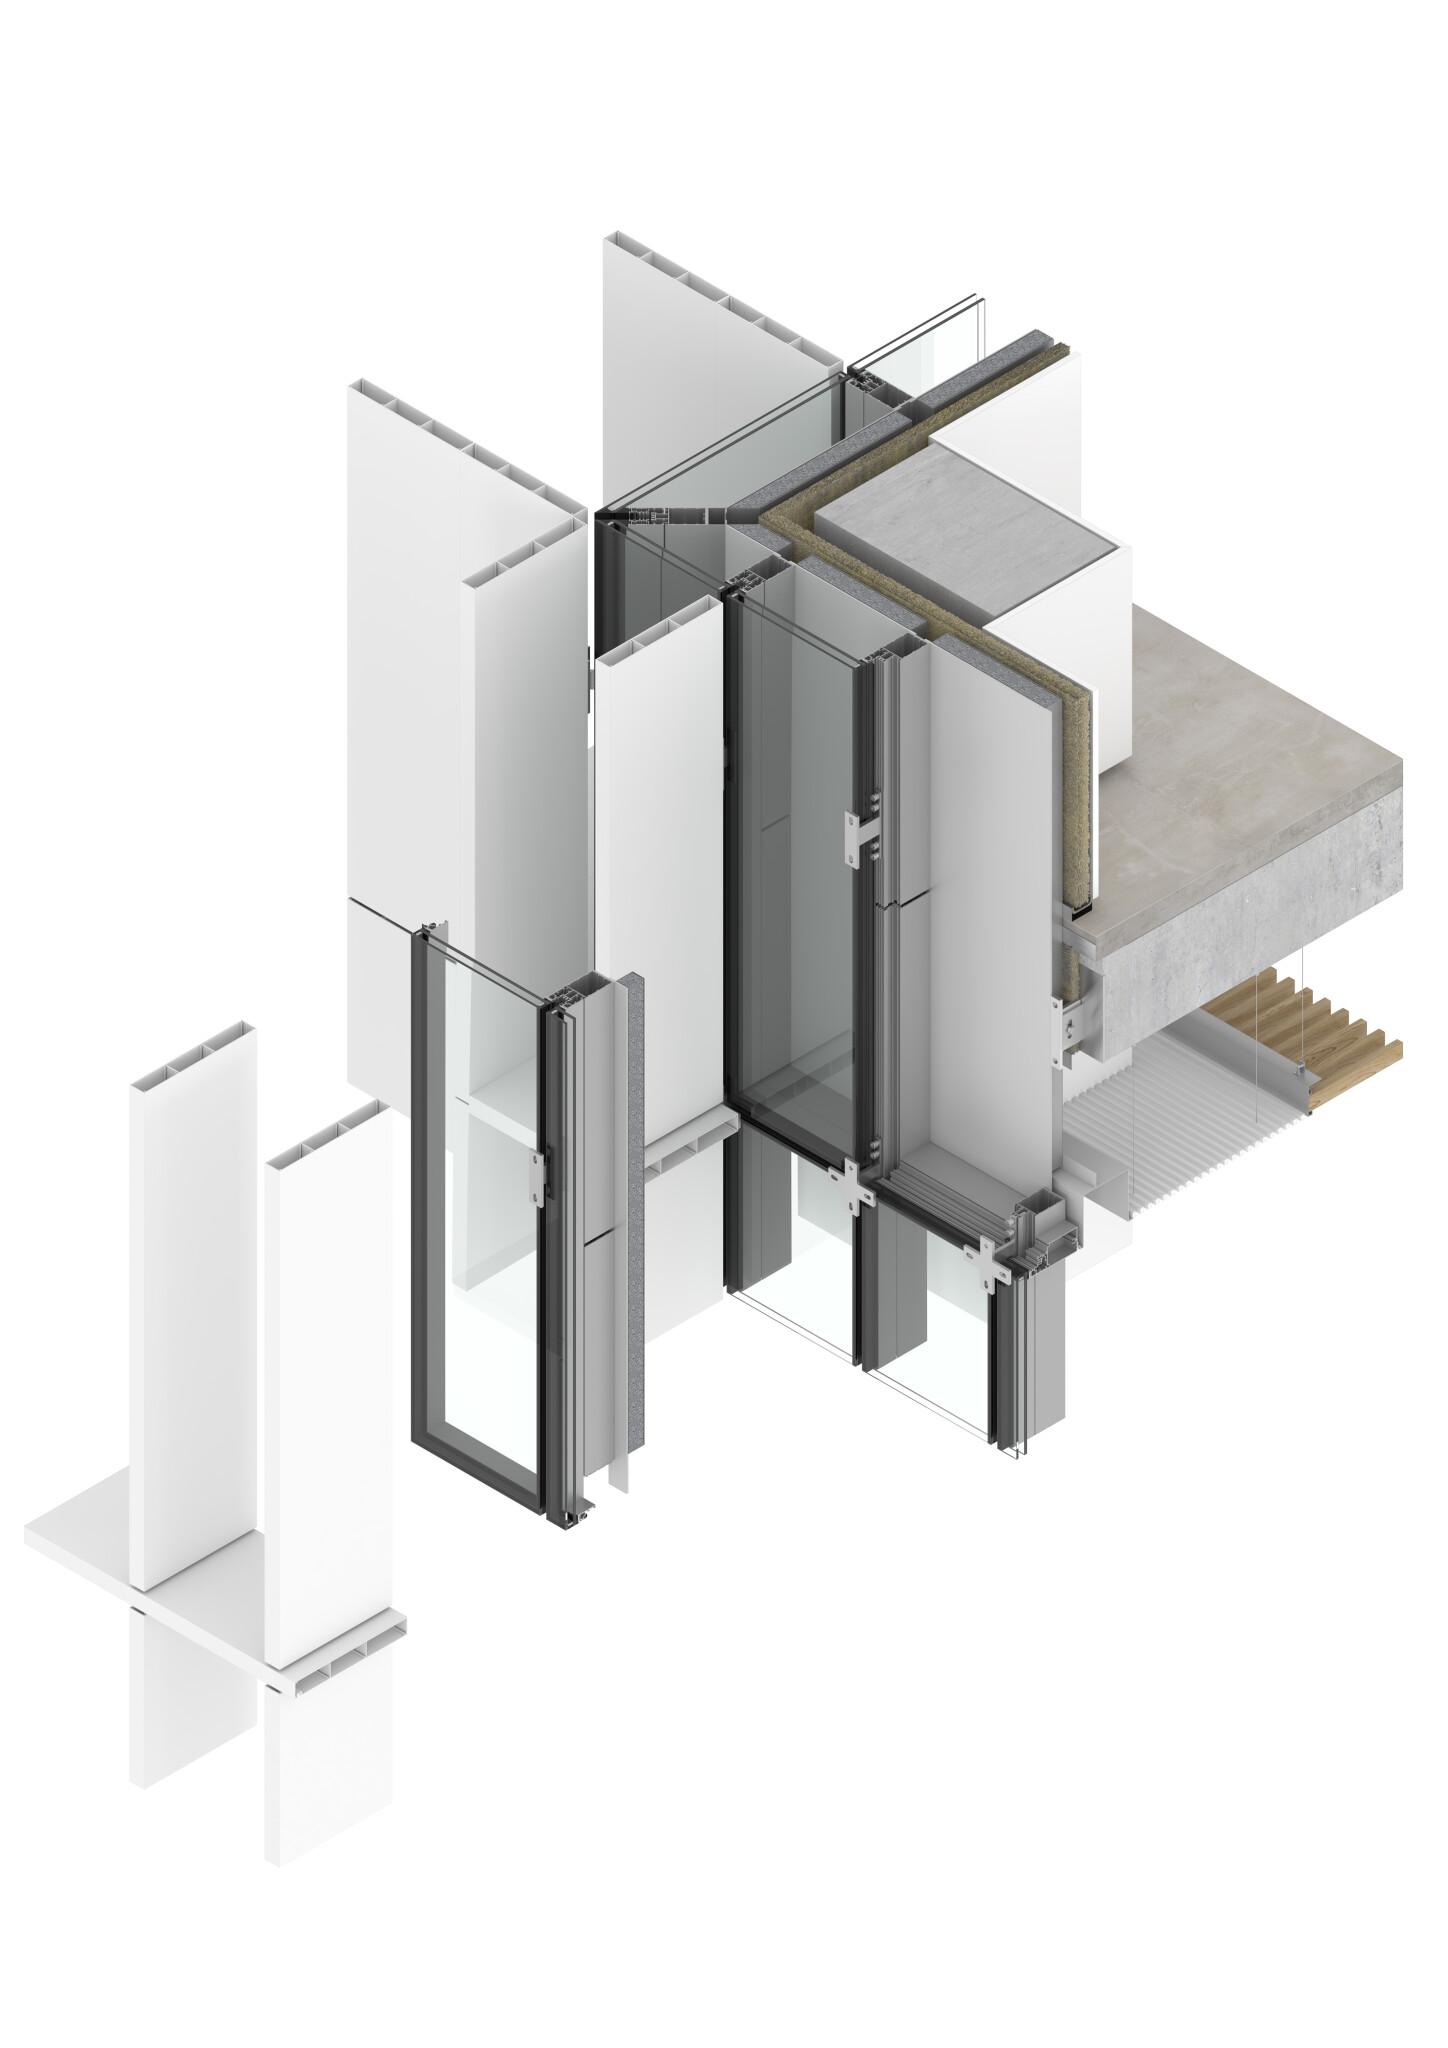 fachada-biocruces-axonométirca-constructiva_riventi